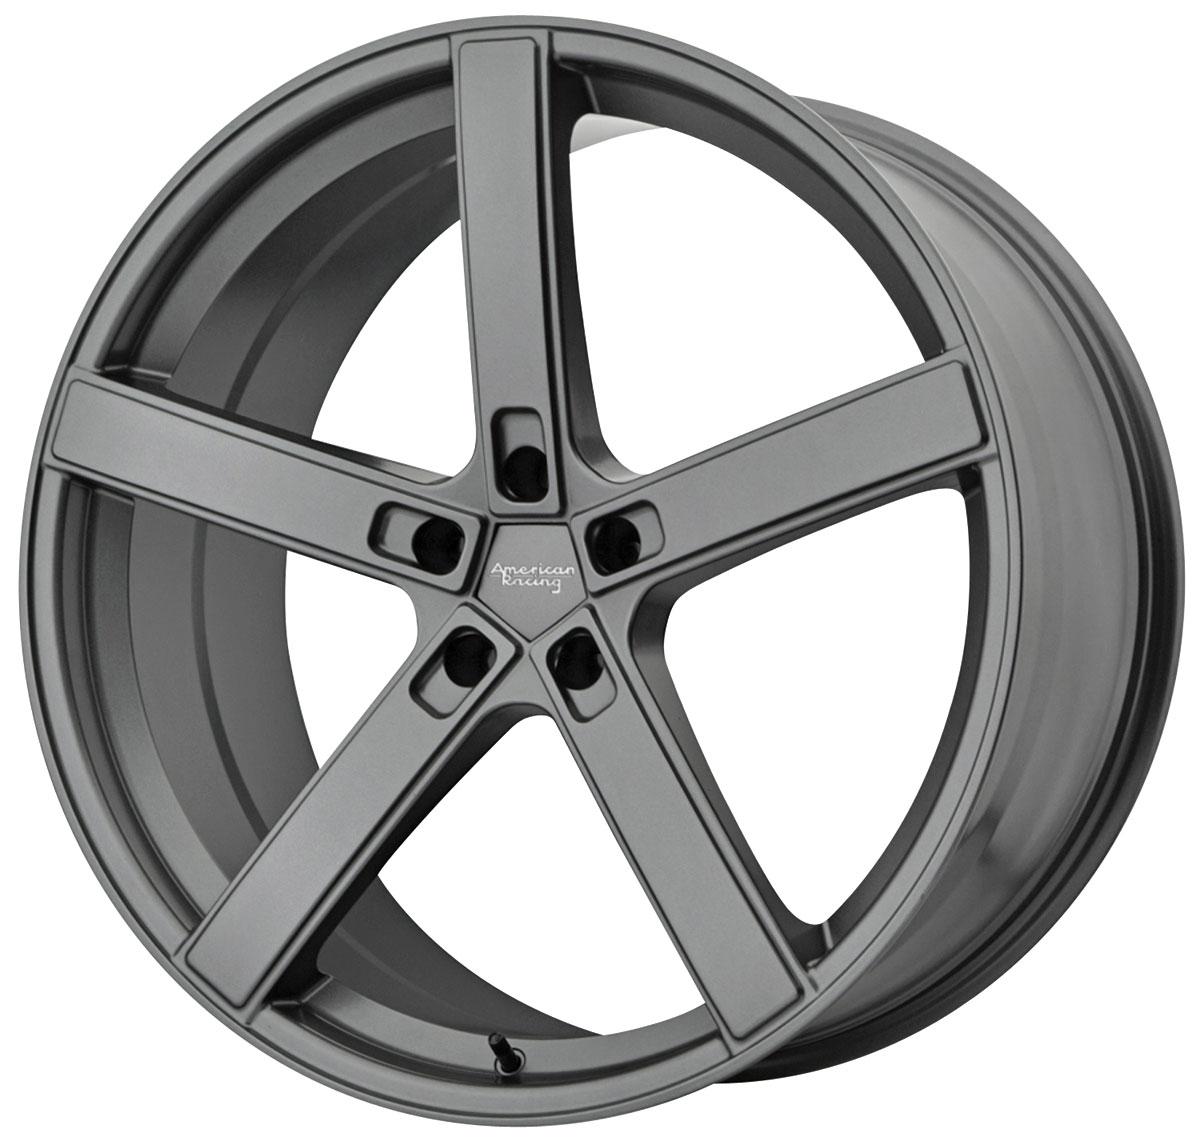 Wheel, American Racing, BLOCKHEAD, 2016-19 CTS/CTS-V, 22x9